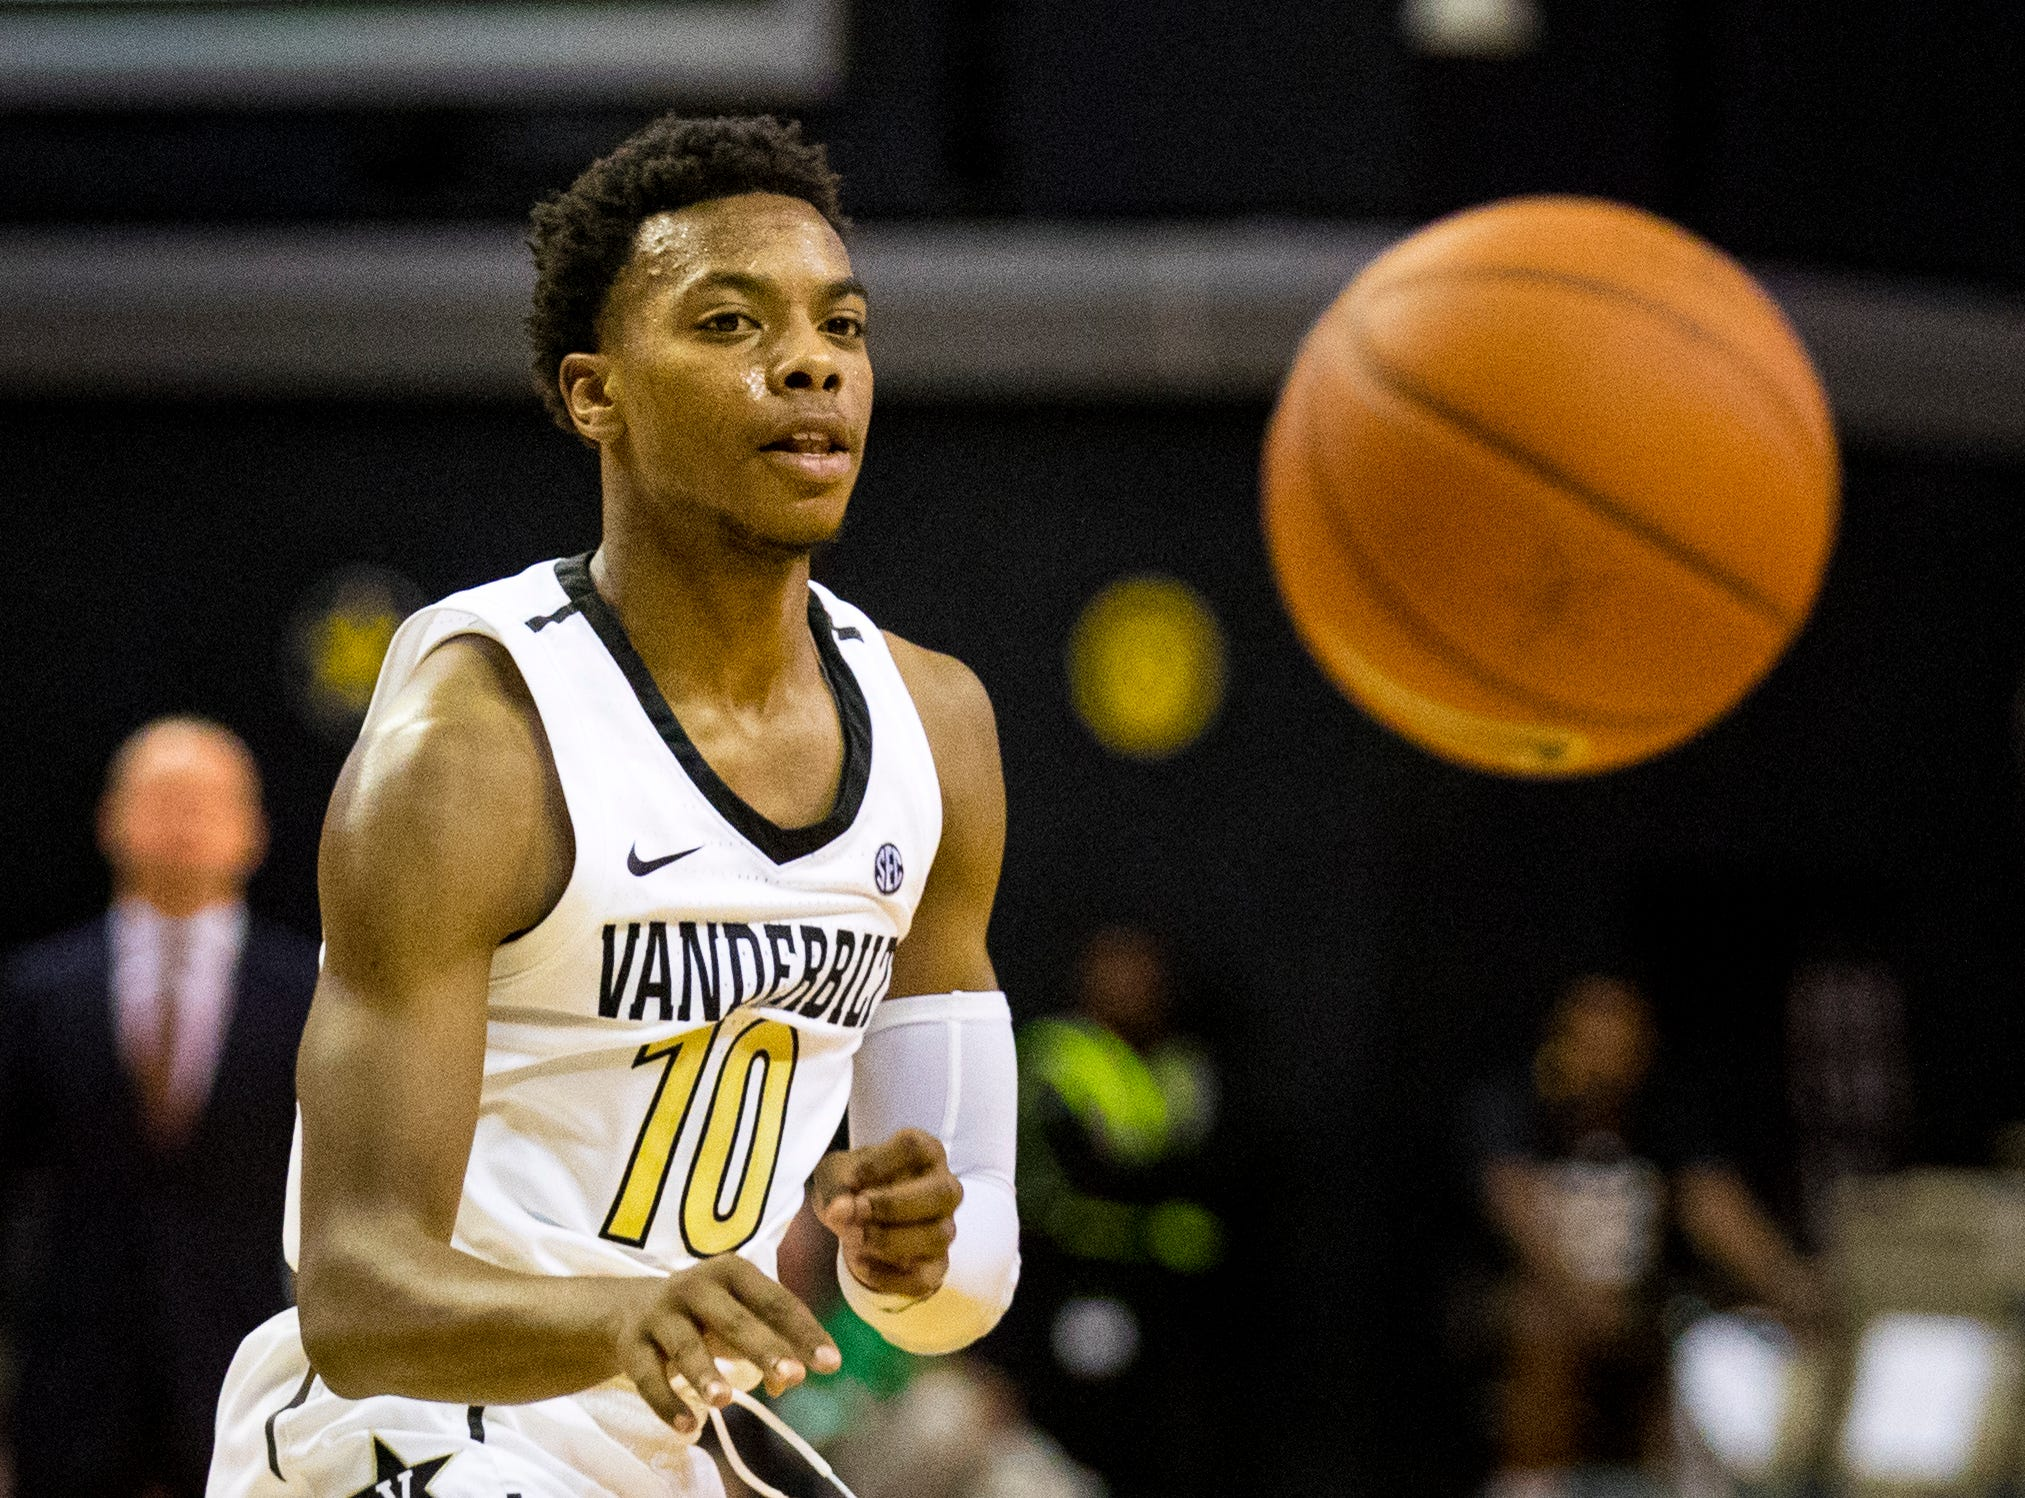 Vanderbilt's Darius Garland (10) passes during Vanderbilt's game against Winthrop at Memorial Gymnasium in Nashville on Tuesday, Nov. 6, 2018.